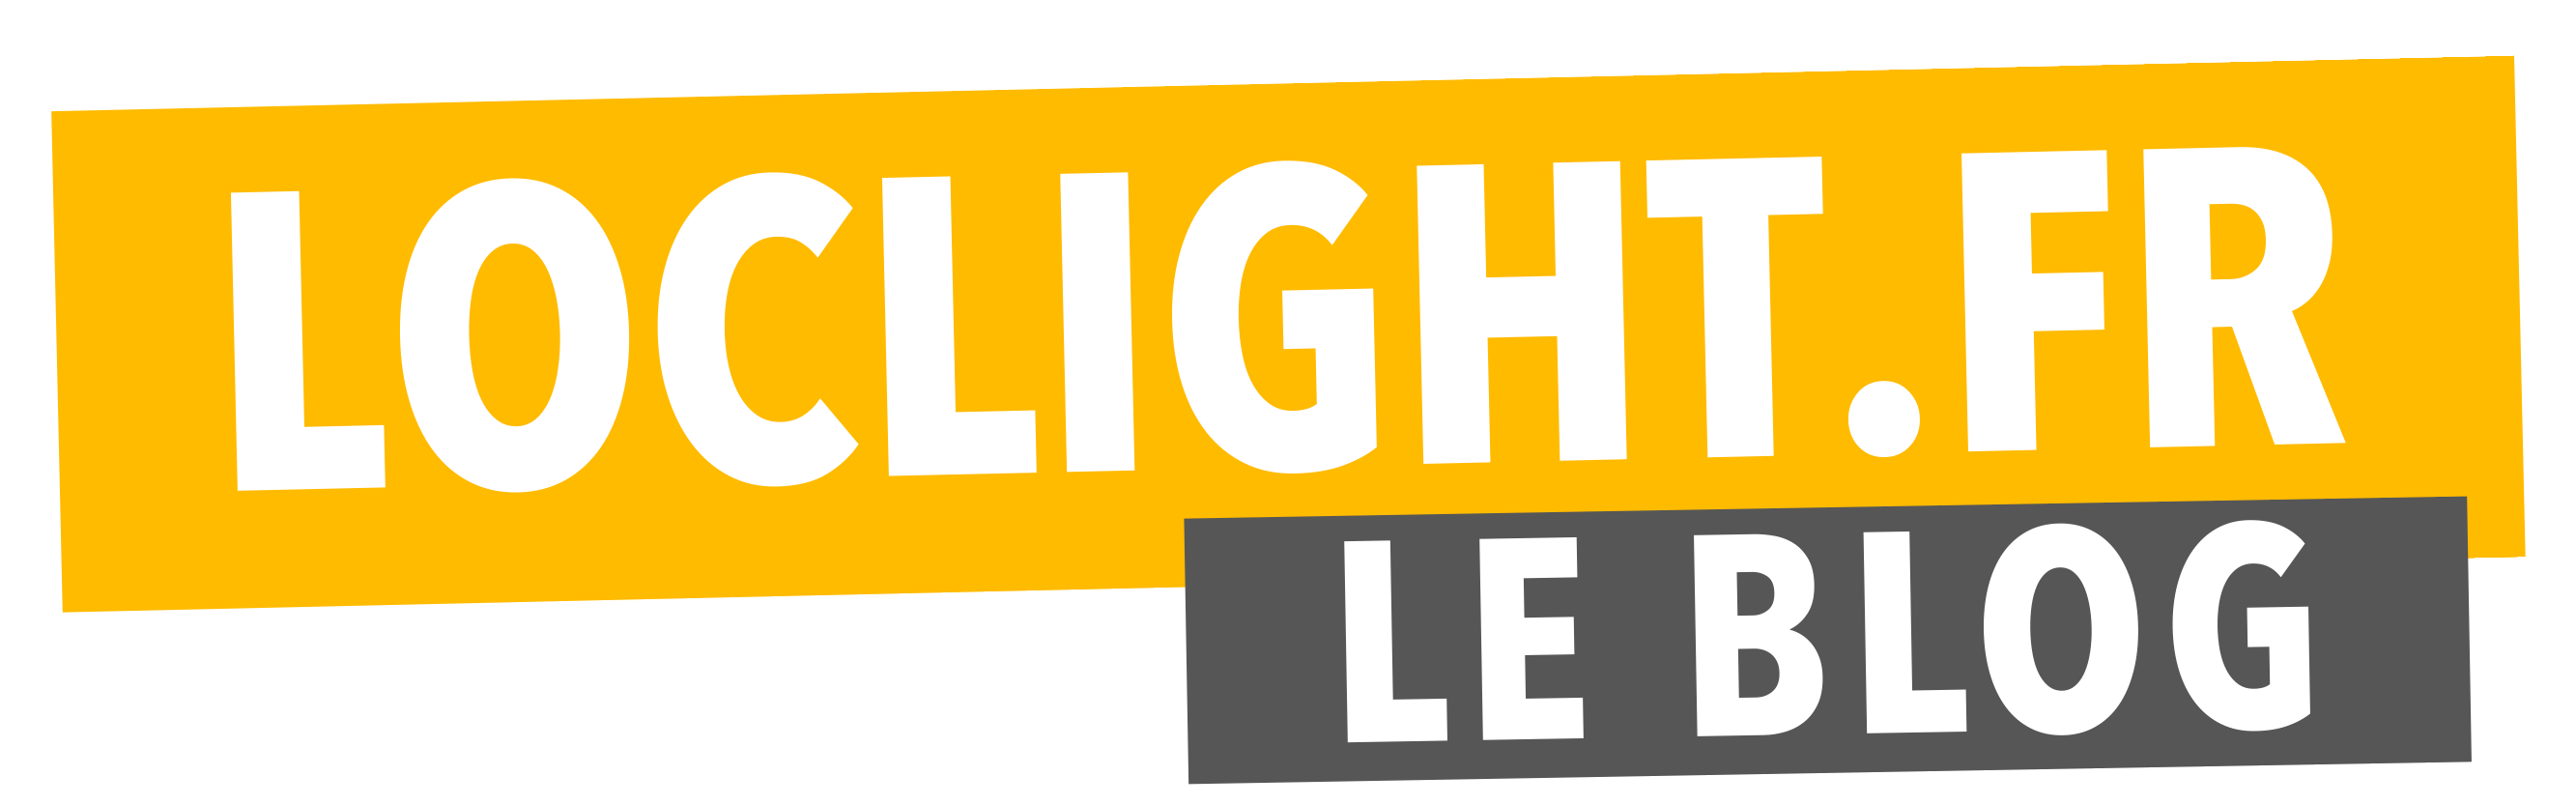 Le Blog Loclight.fr